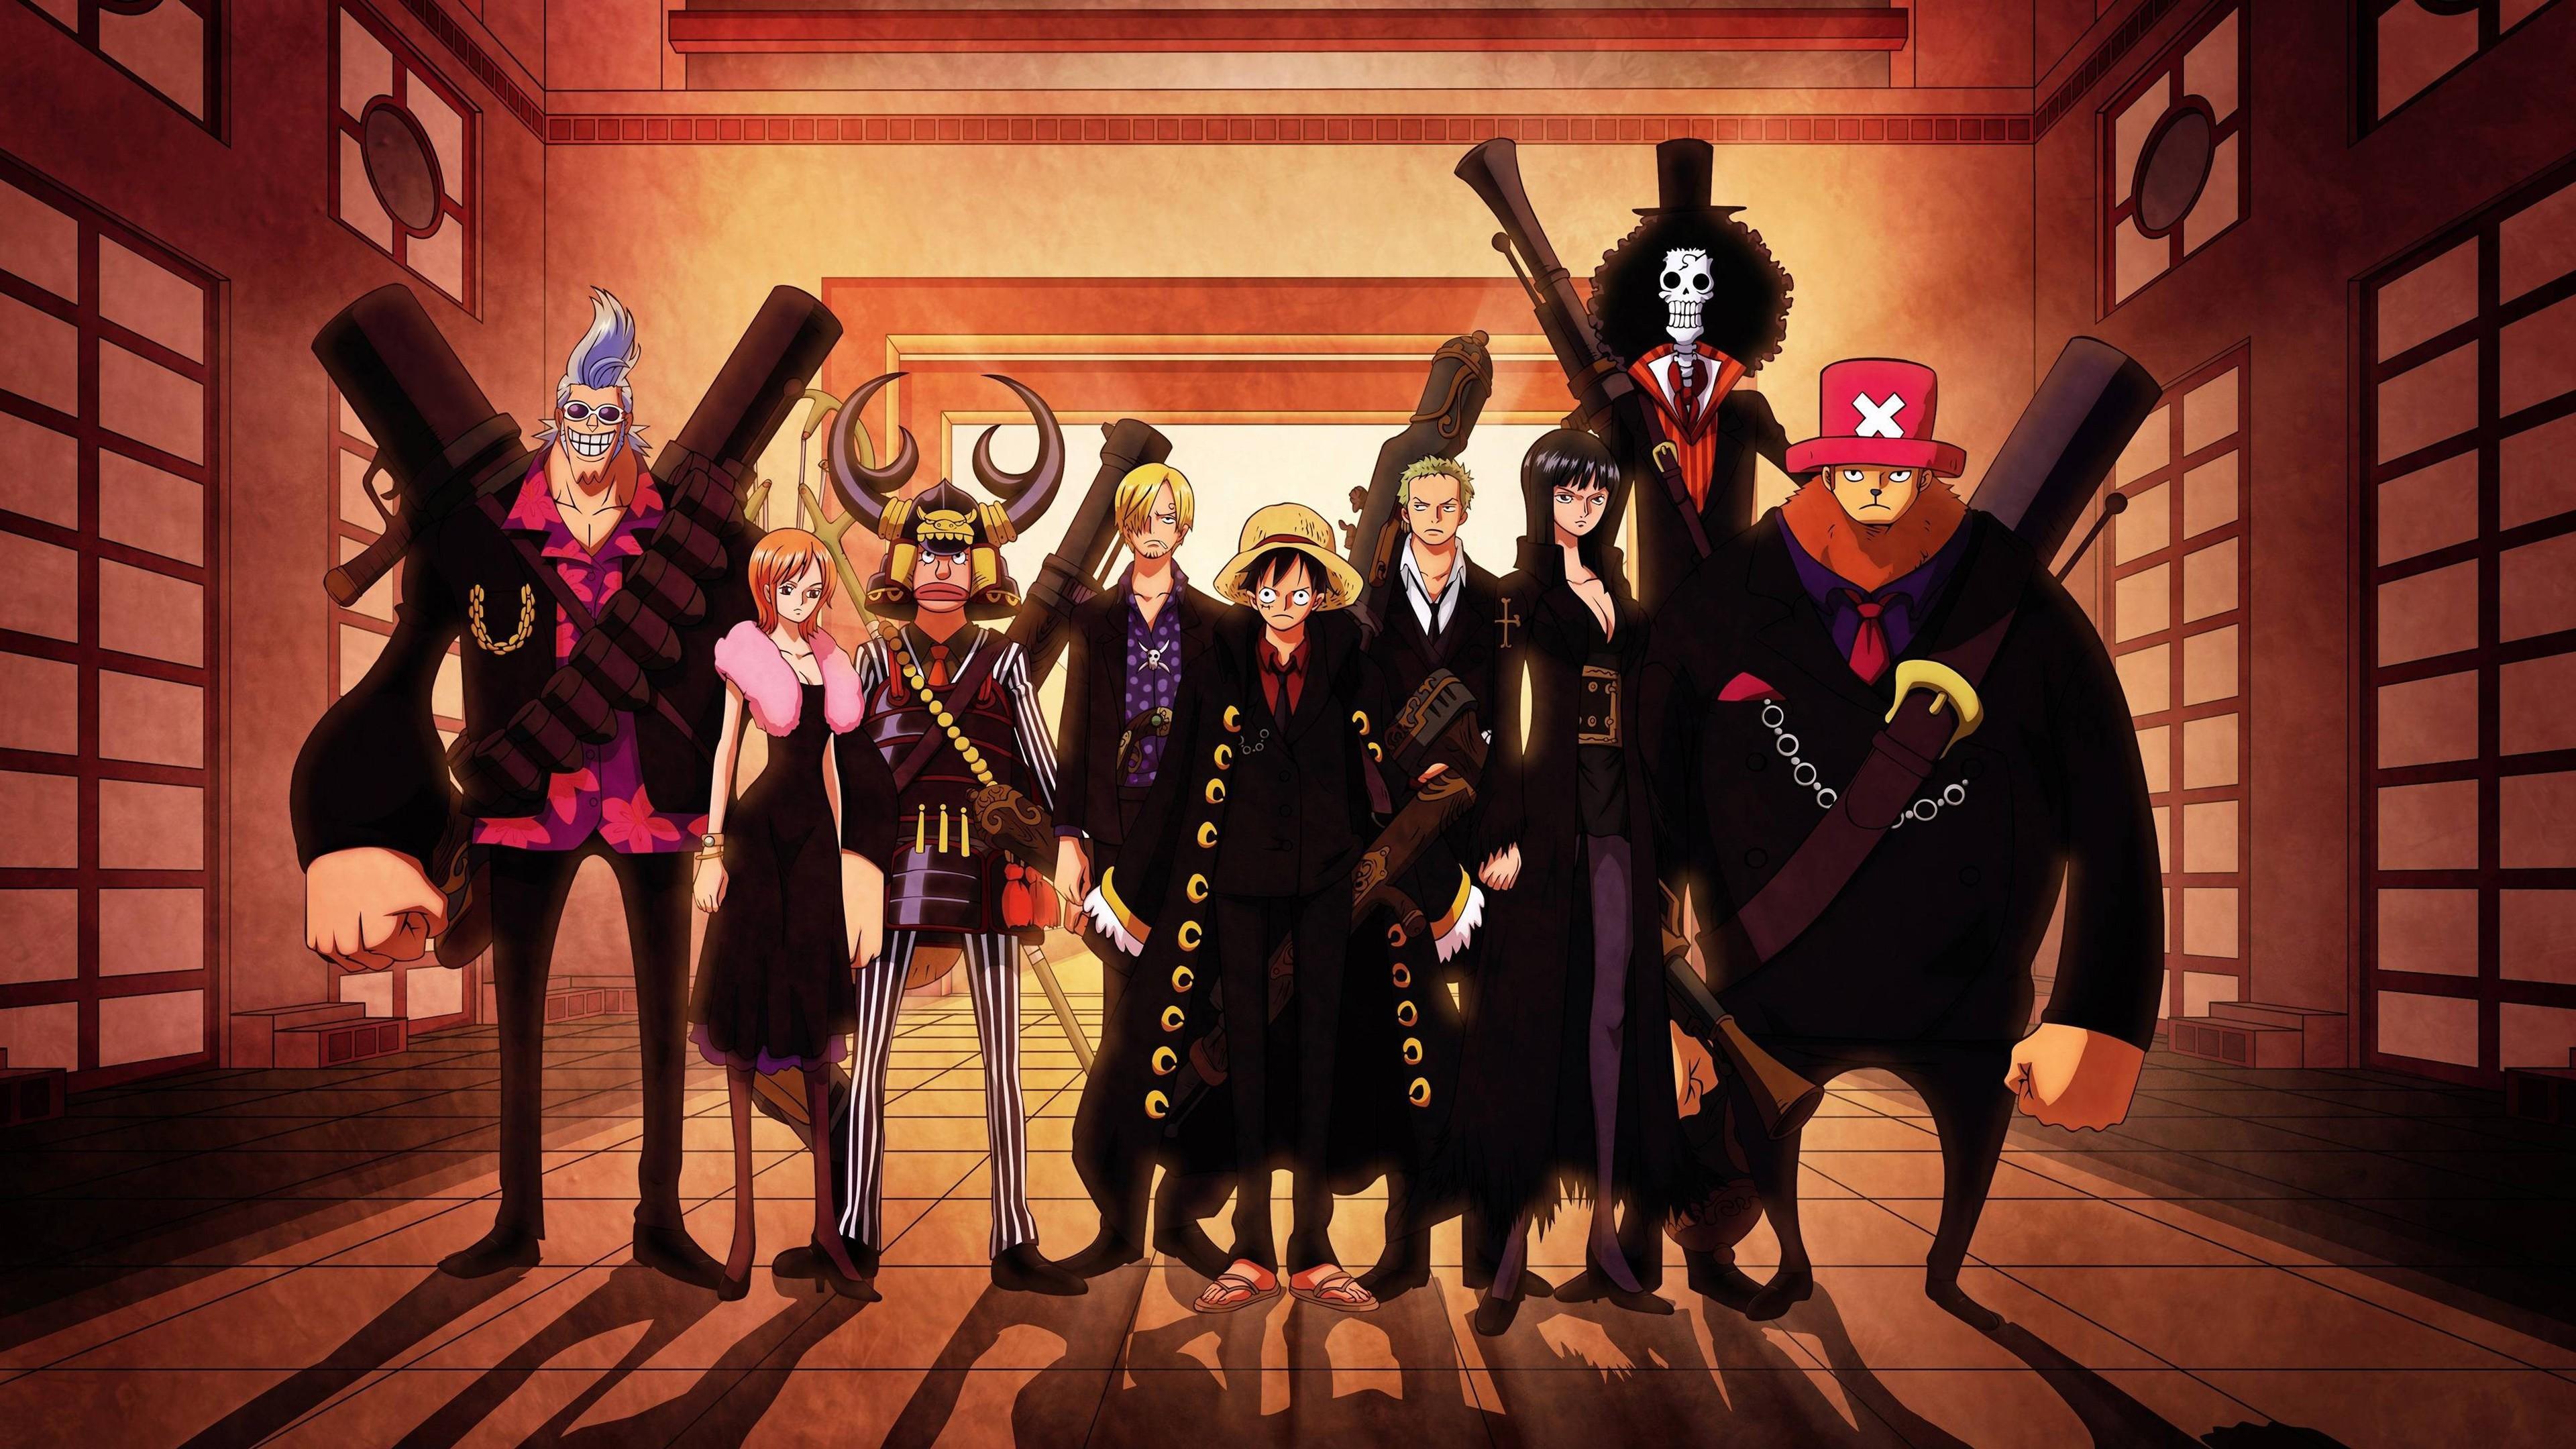 one piece anime 1541973527 - One Piece Anime - one piece wallpapers, anime wallpapers